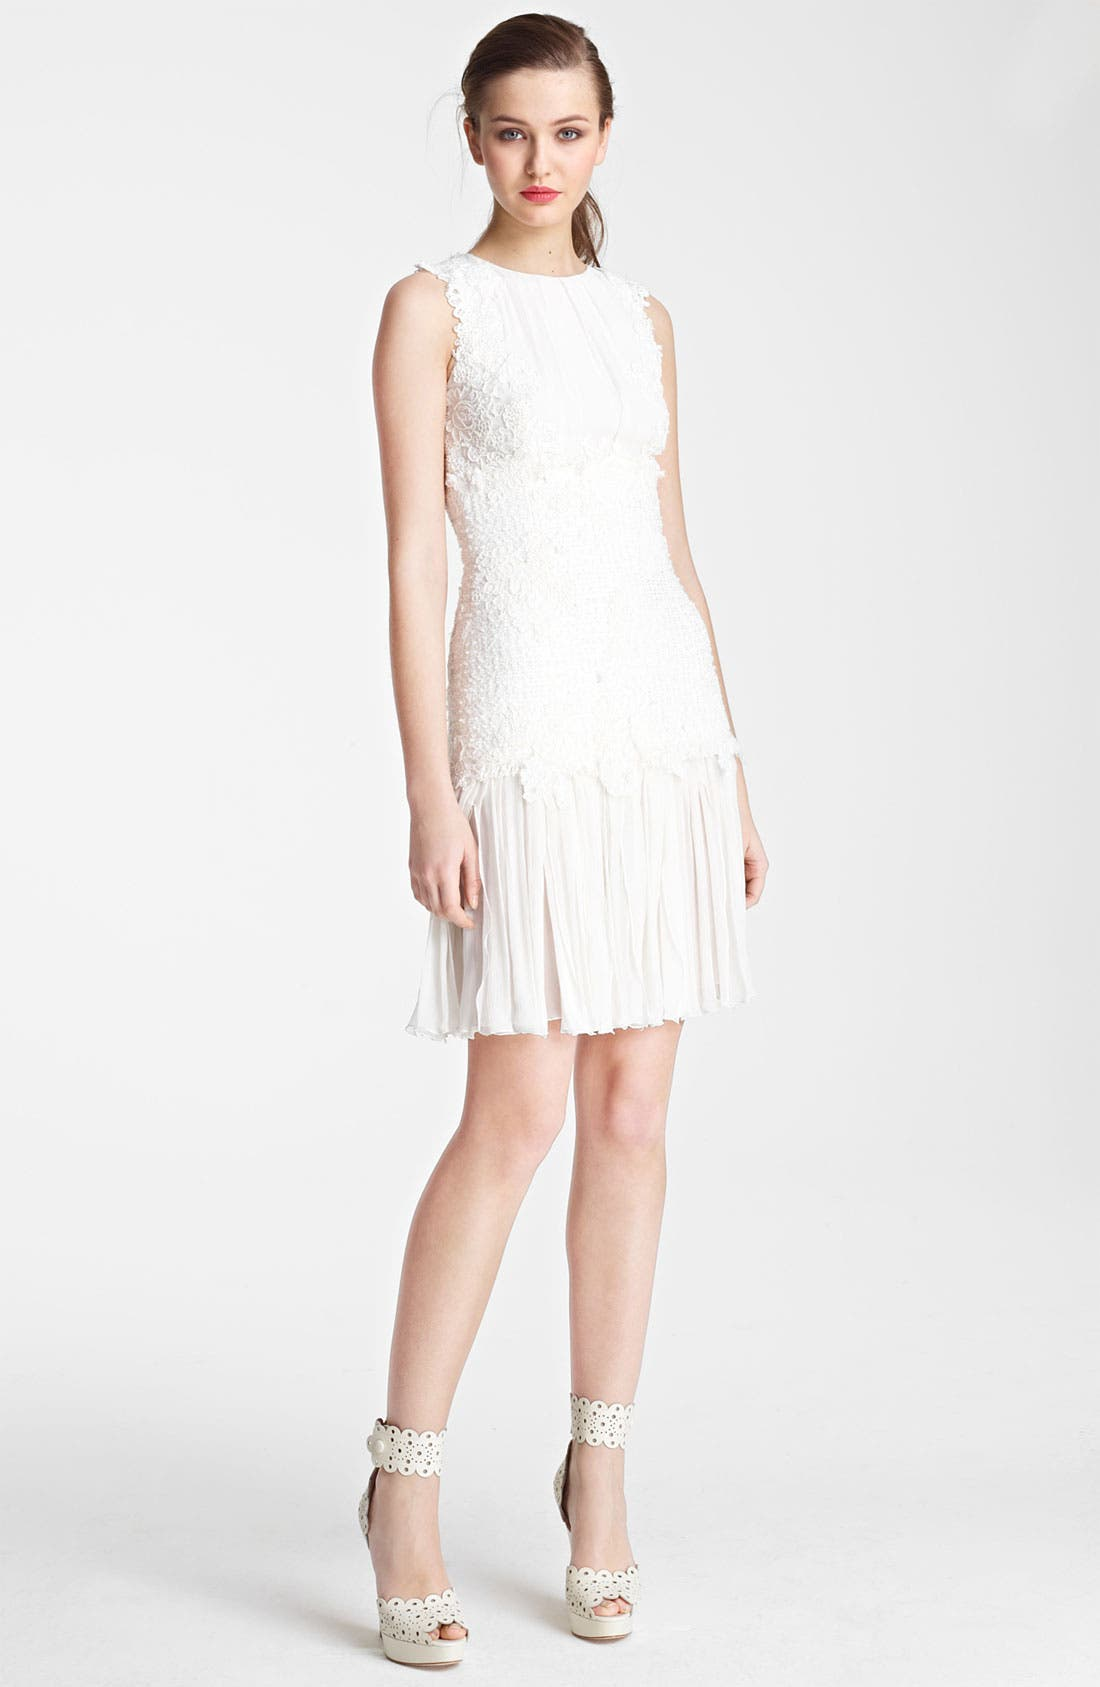 Alternate Image 1 Selected - Oscar de la Renta Chiffon Dress